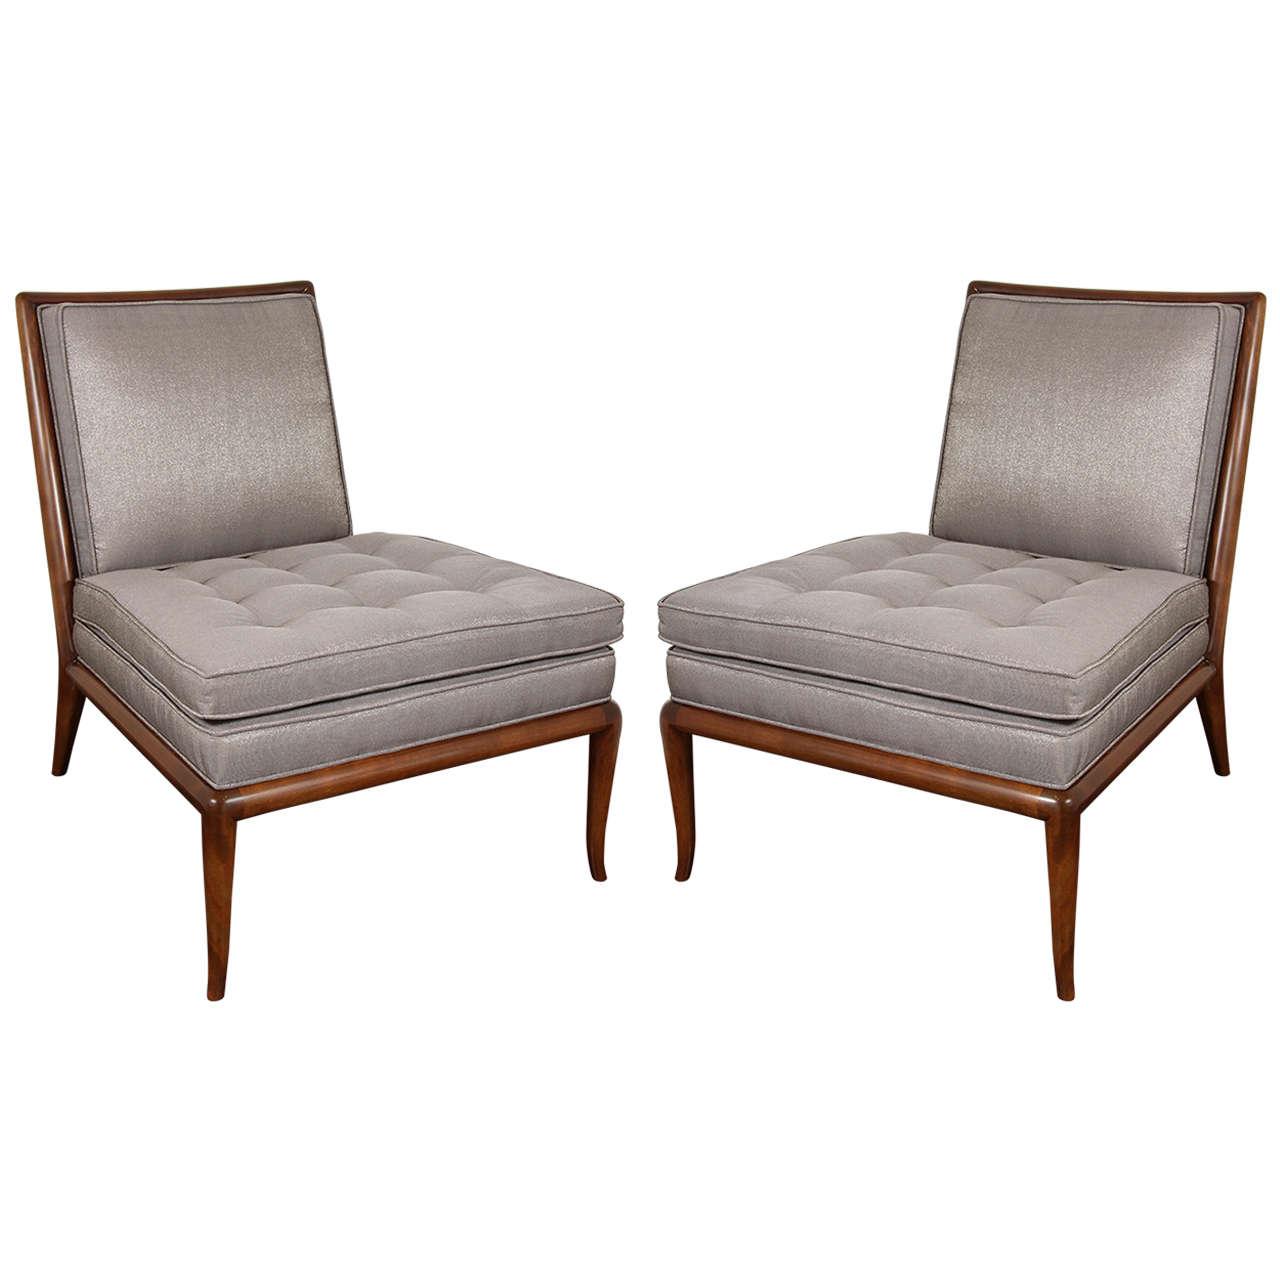 upholstered slipper chair banquet covers black pair of t h robsjohn gibbings chairs